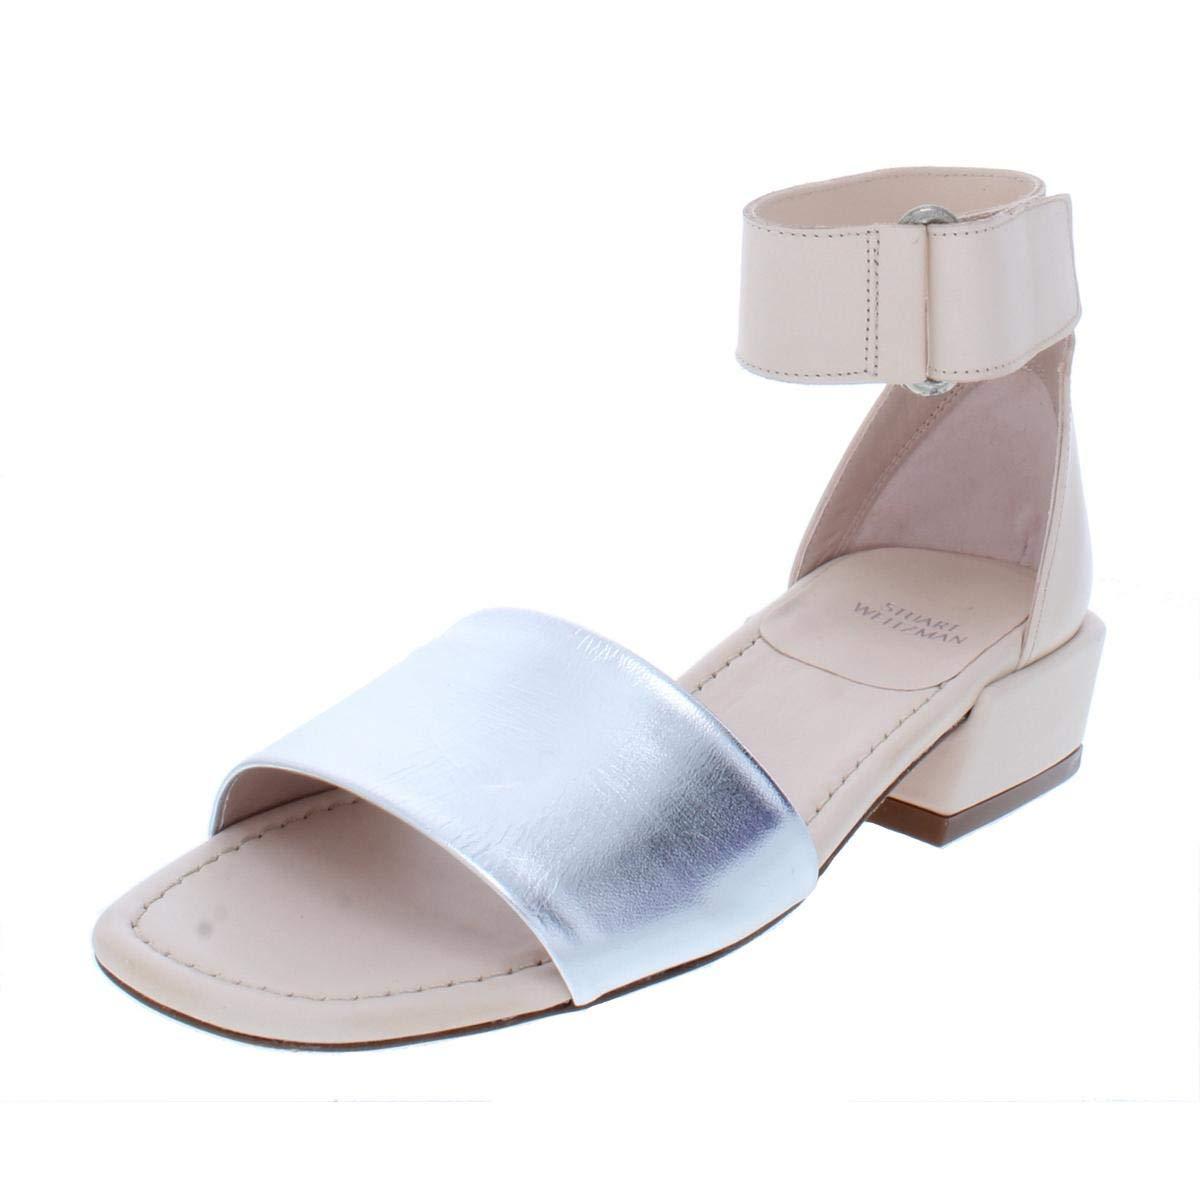 Silver Supple Leather Stuart Weitzman Womens Oneway Leather Metallic Dress Sandals